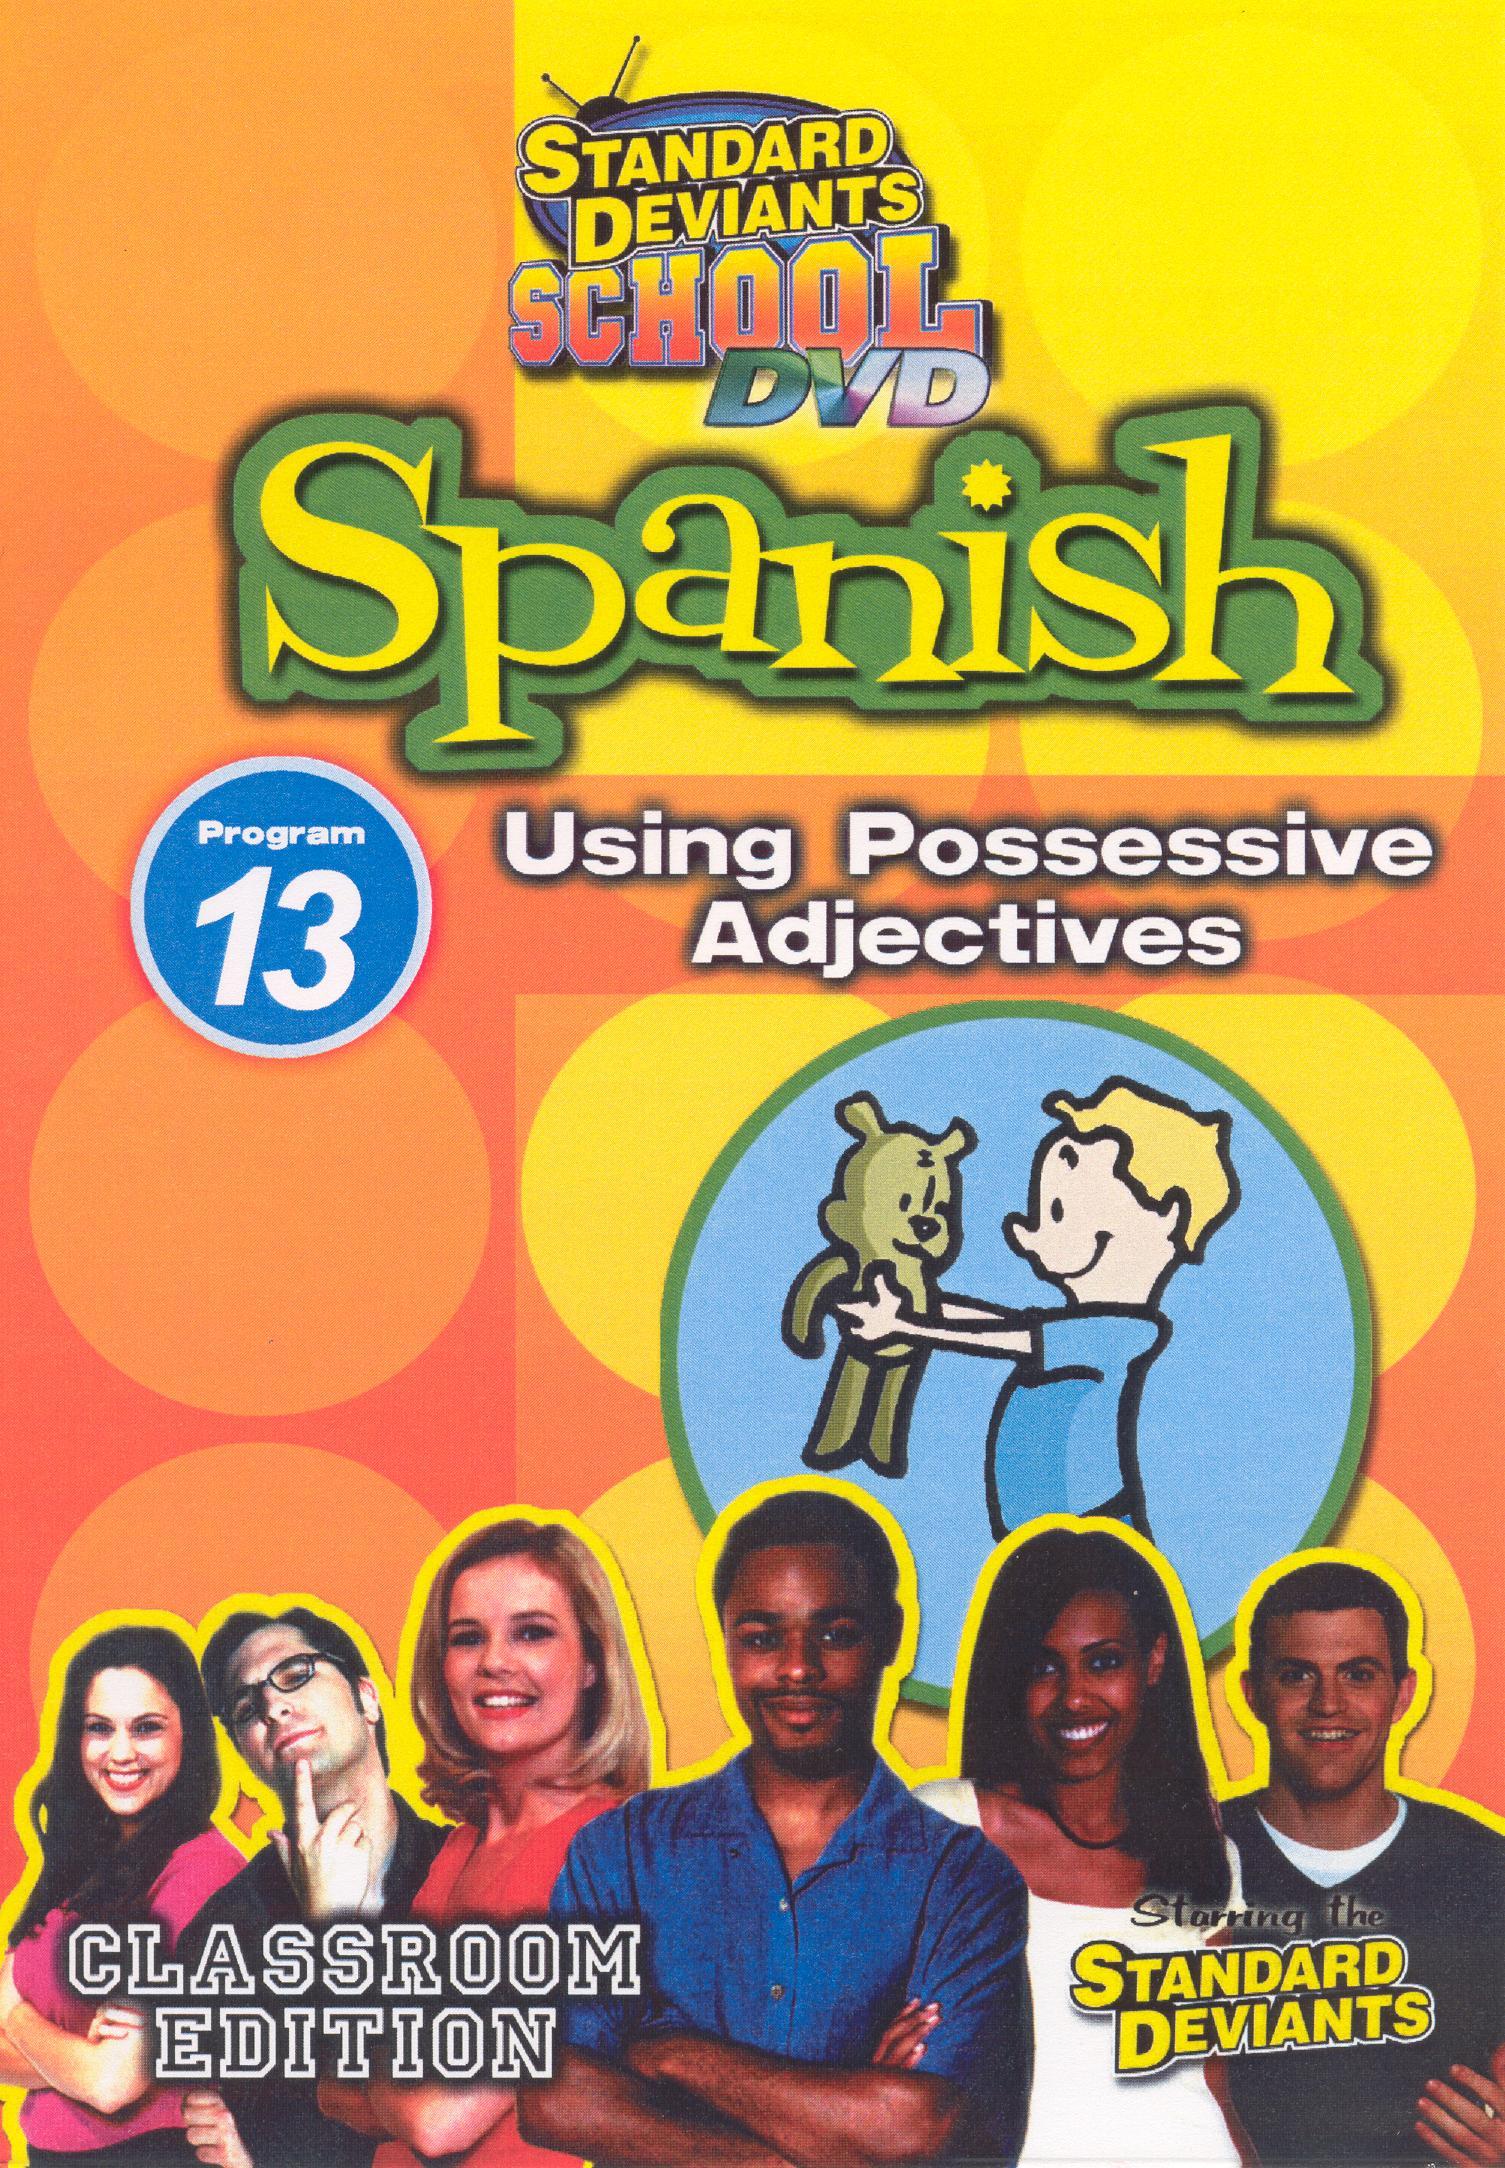 Standard Deviants School: Spanish, Program 13